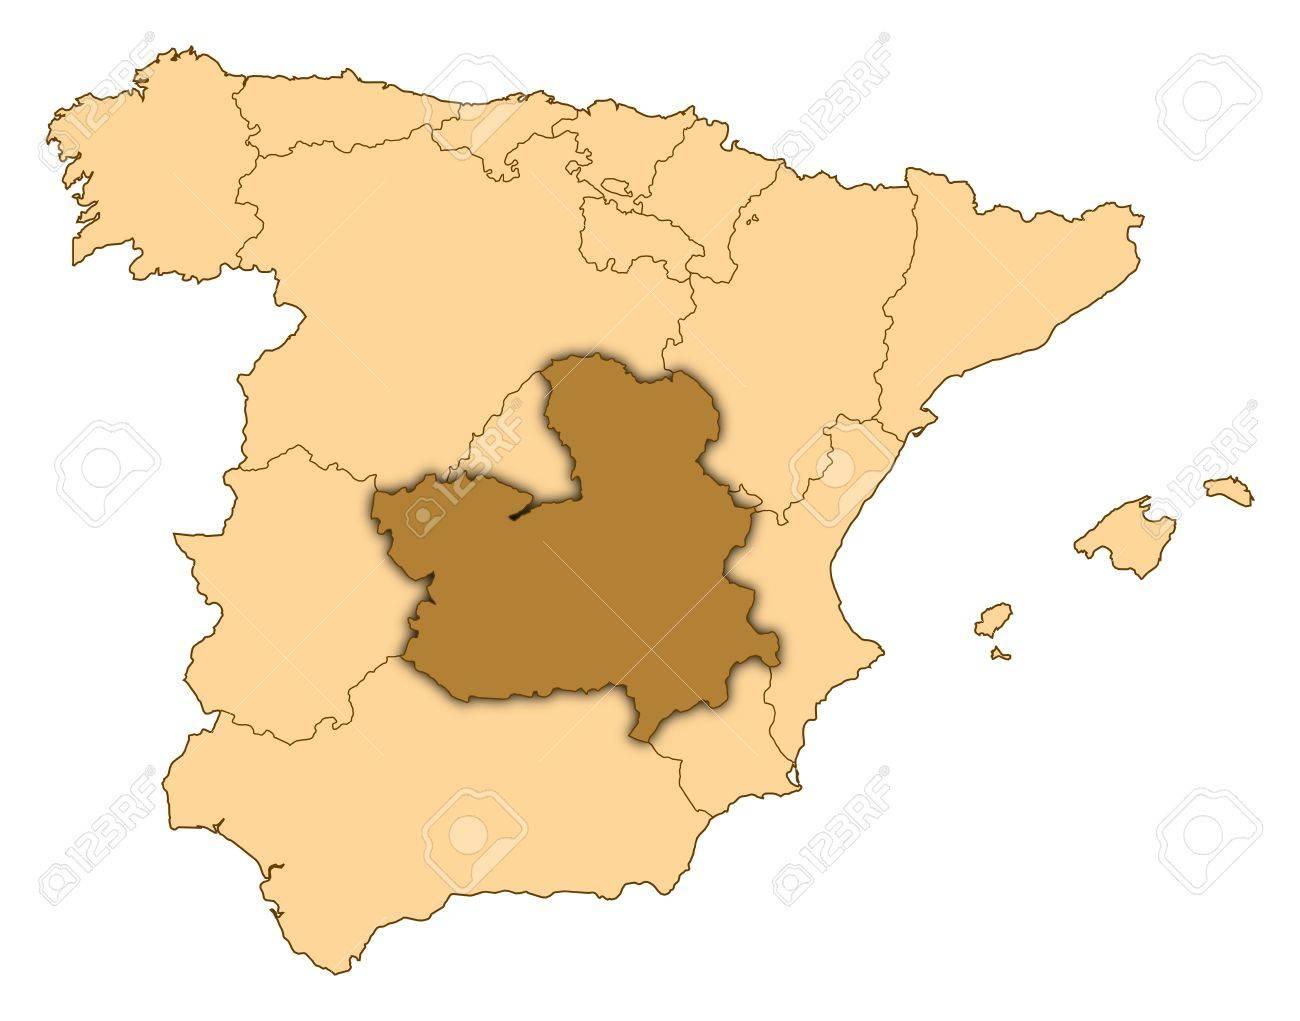 La Mancha Spain Map.Map Of Spain Where Castile La Mancha Is Highlighted Stock Photo